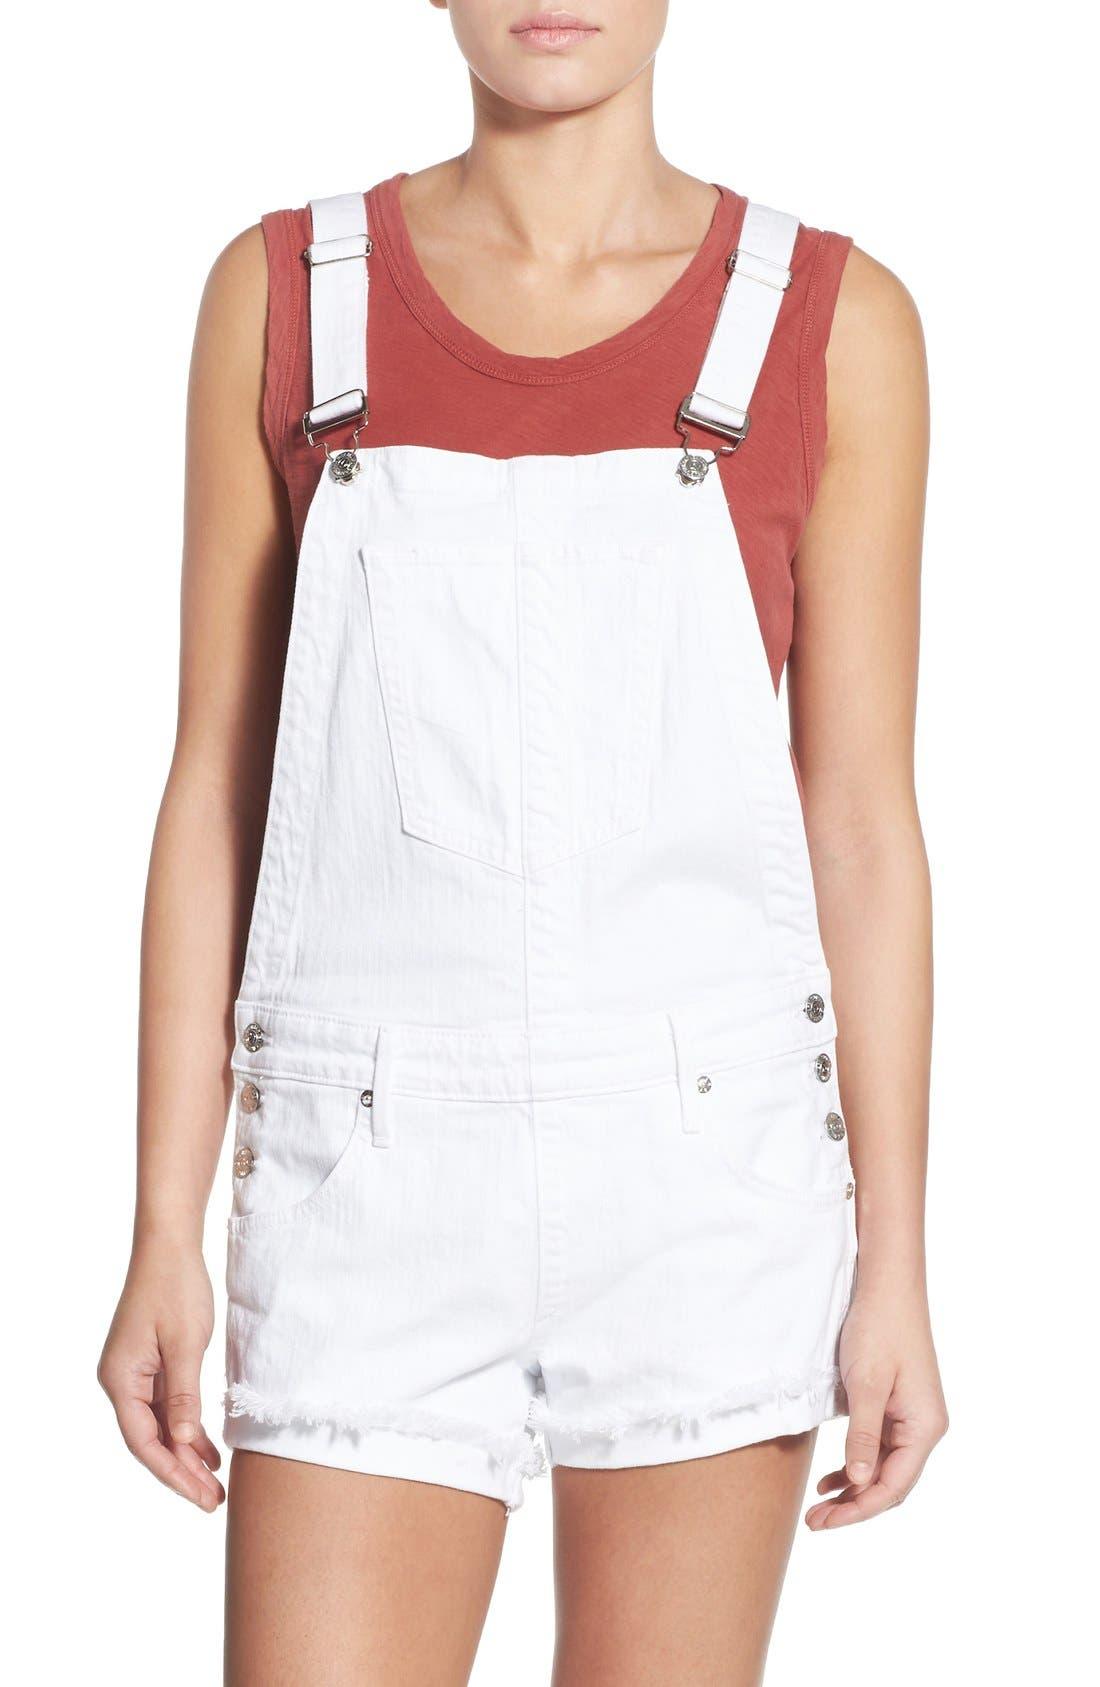 Main Image - True Religion Brand Jeans Denim Short Overalls (Optic White)